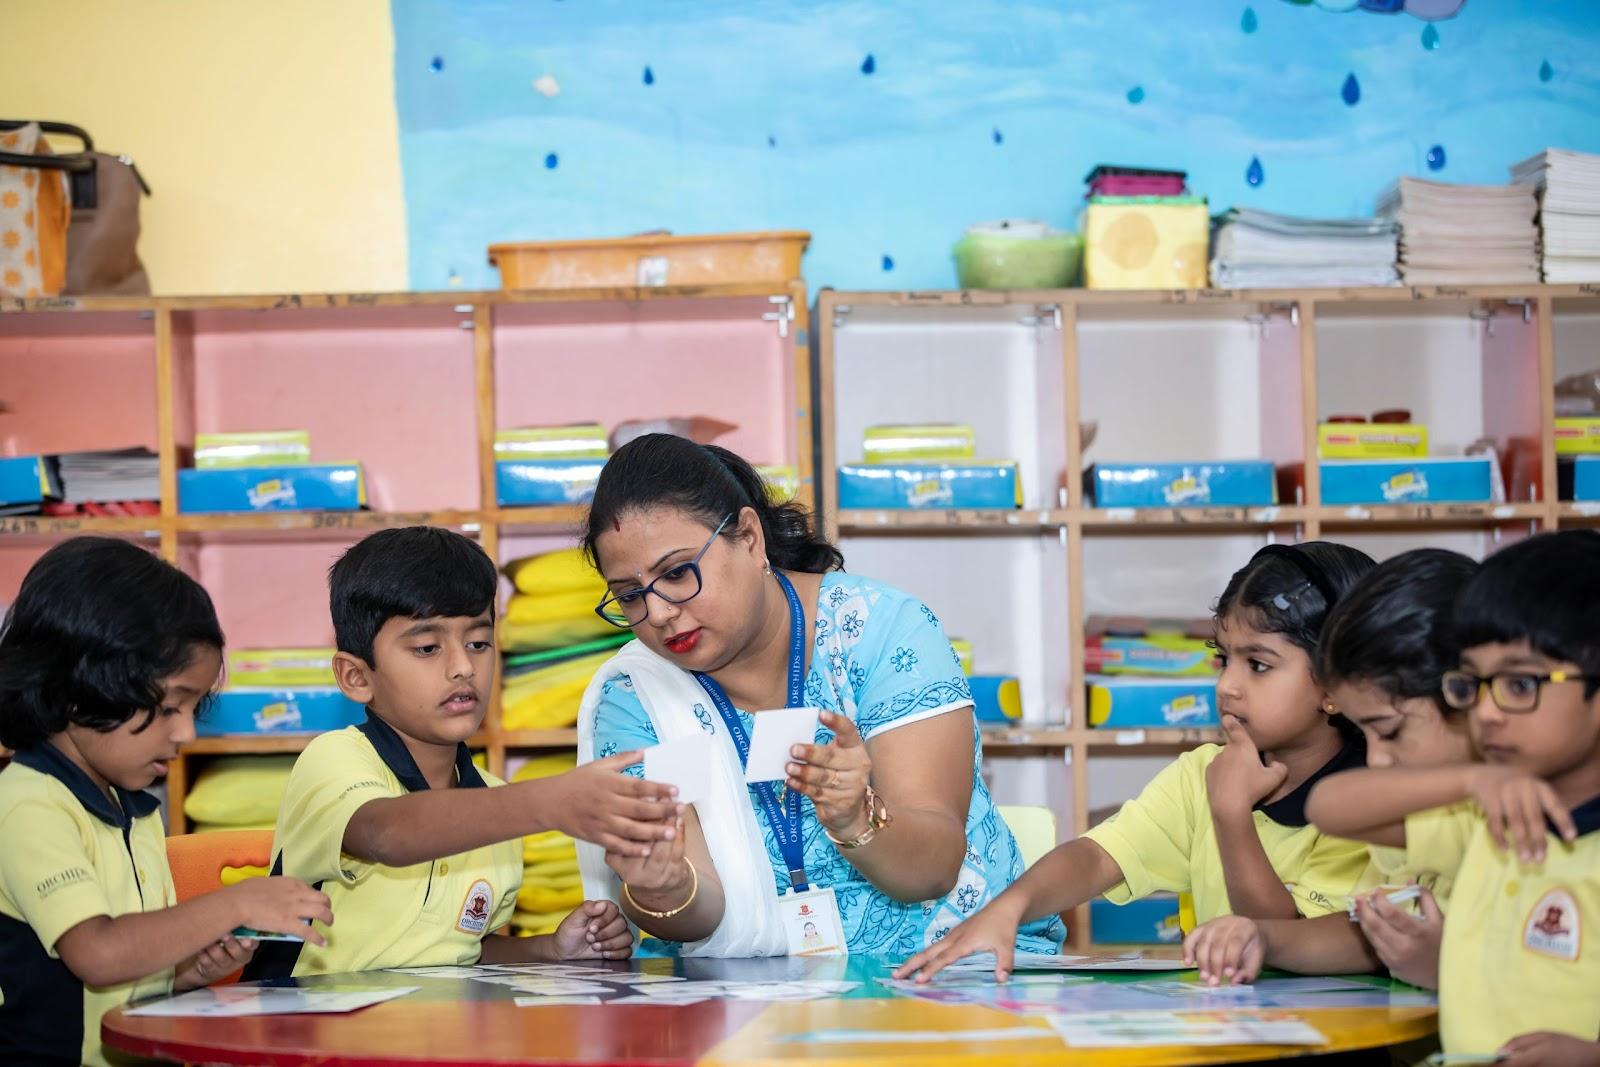 CBSE school focuses on all aspects of health